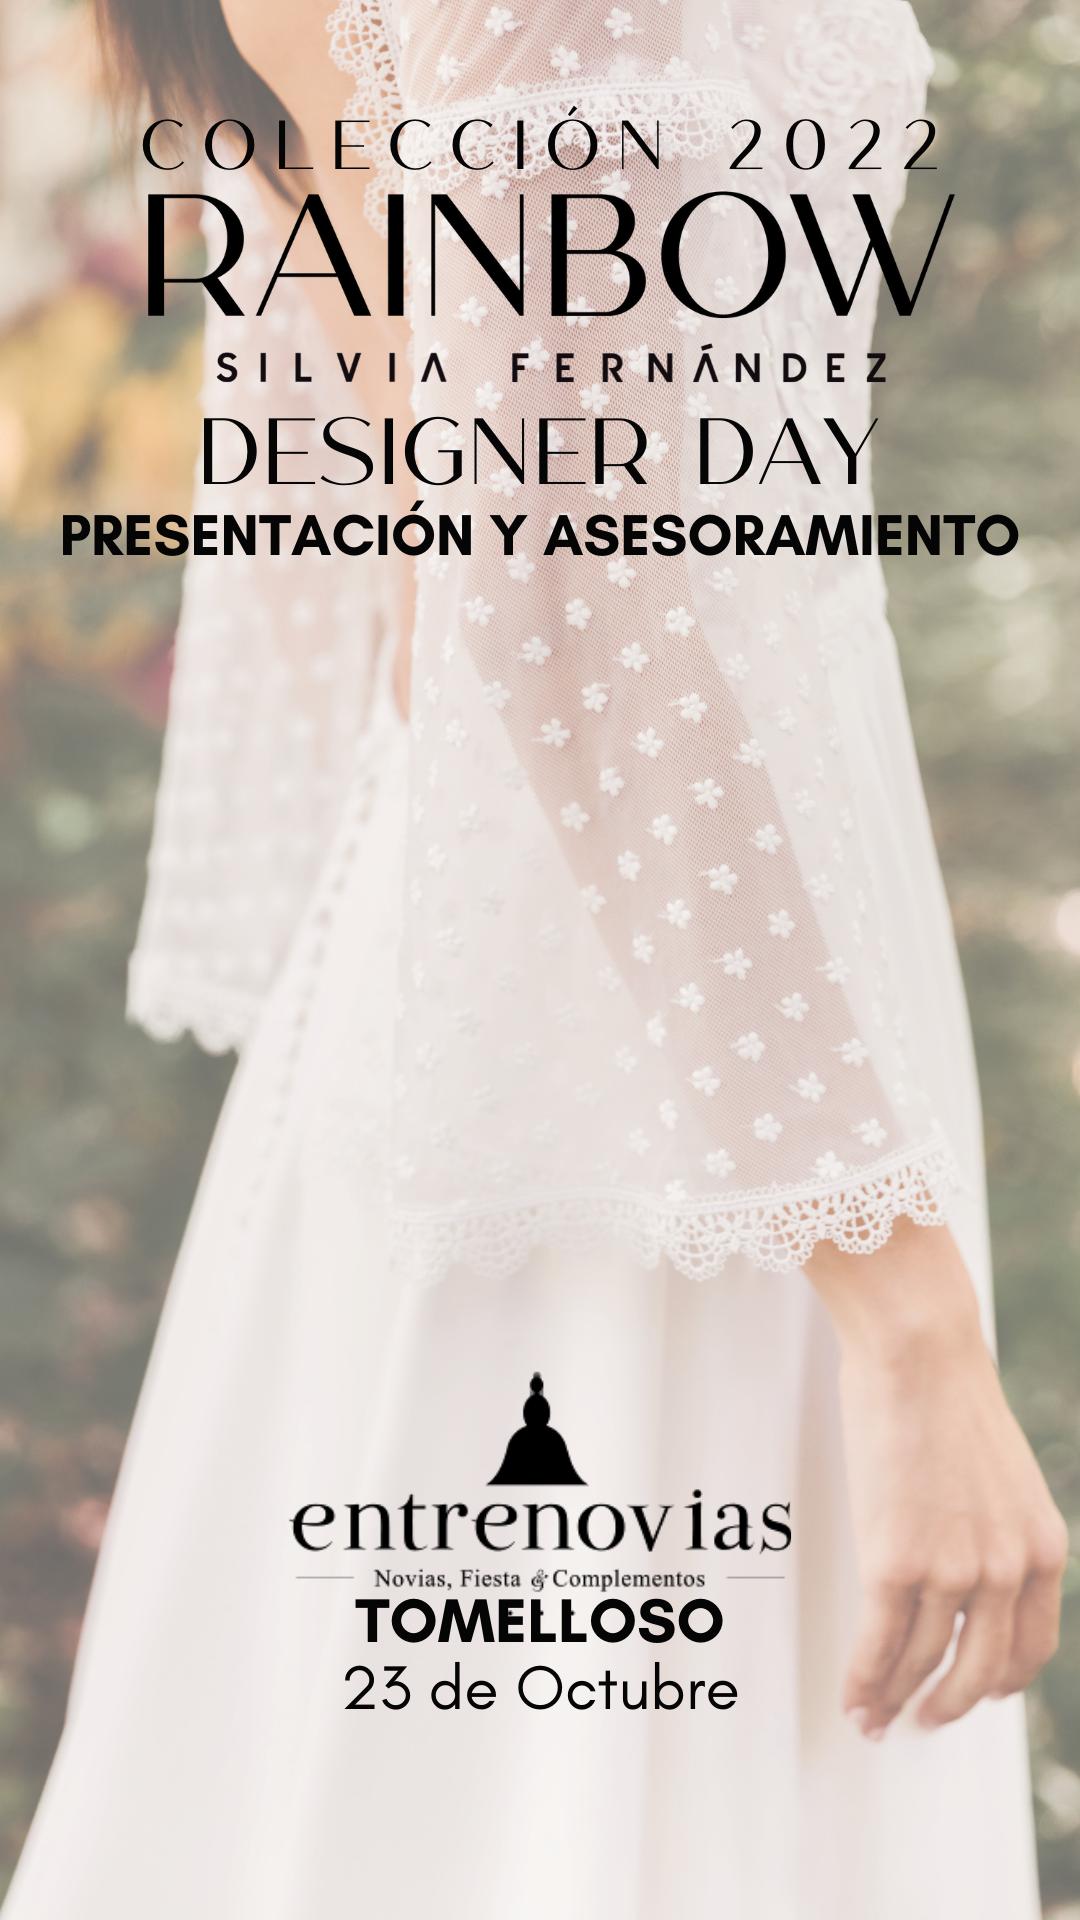 evento Rainbow Entrenovias - Silvia Fernandez